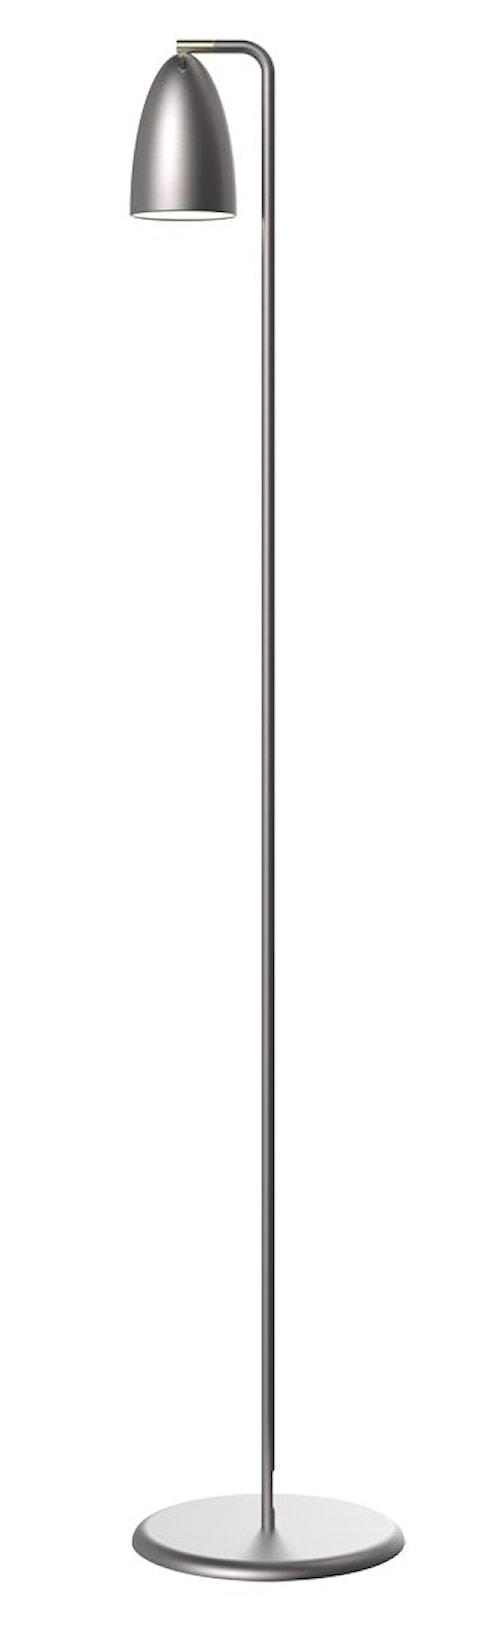 Nexus 10 golvlampa - Borstat stål